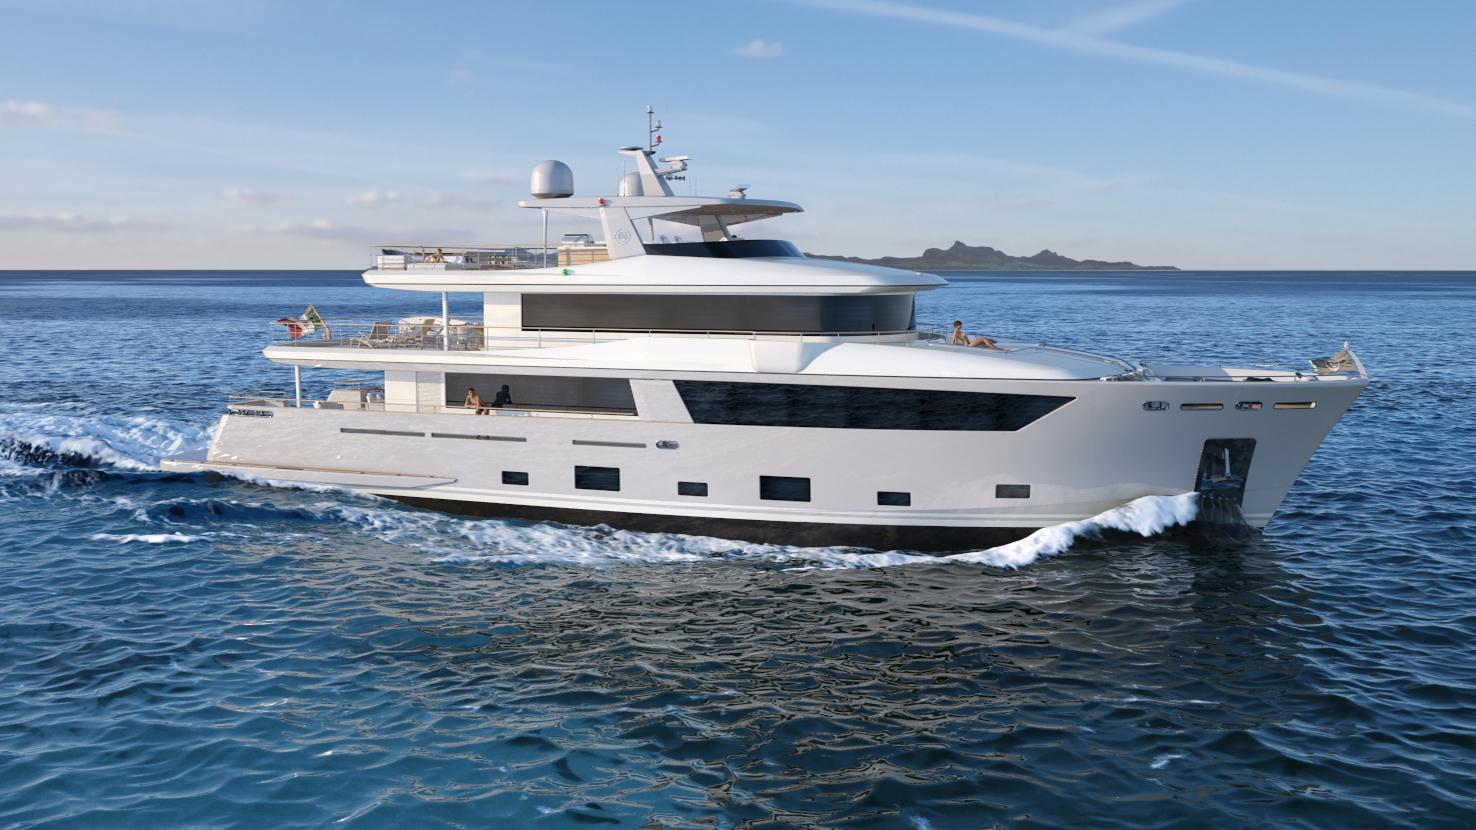 narvalo-motor-yacht-cantiere-delle-marche-2016-31m-nauta-air-108-cruising-profile